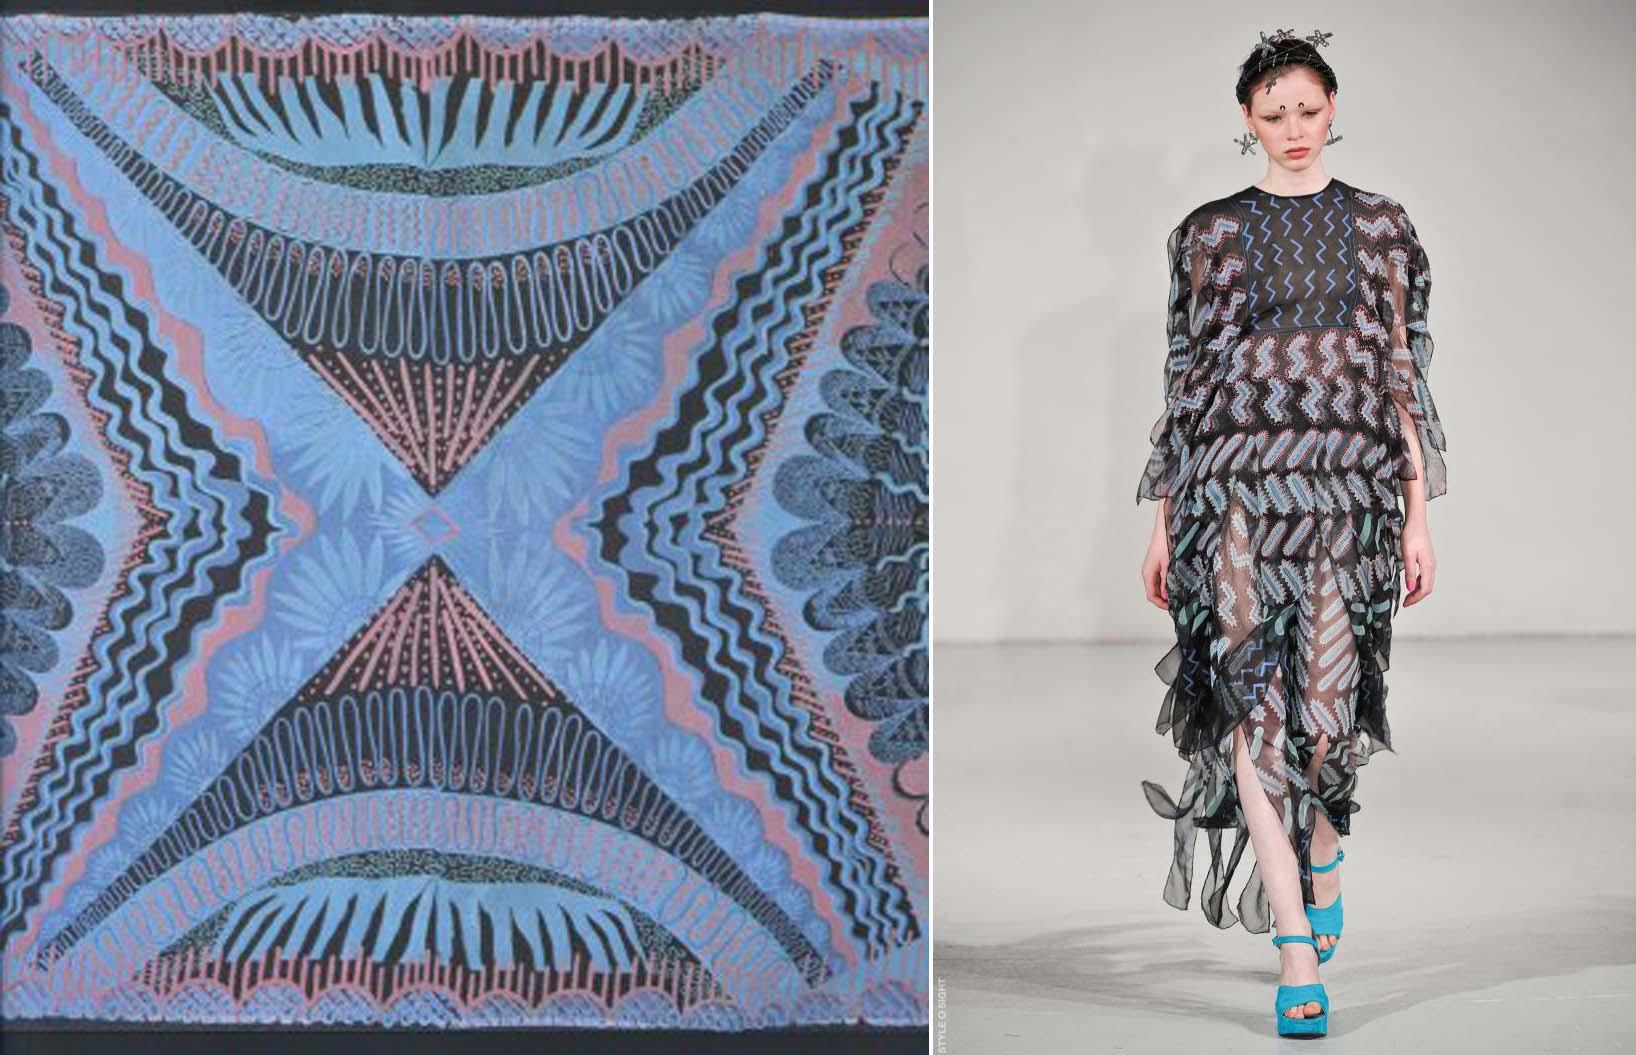 Zandra-Rhodes-Retrospective-Fashion-Show-Paris-FW-12-1221.jpg